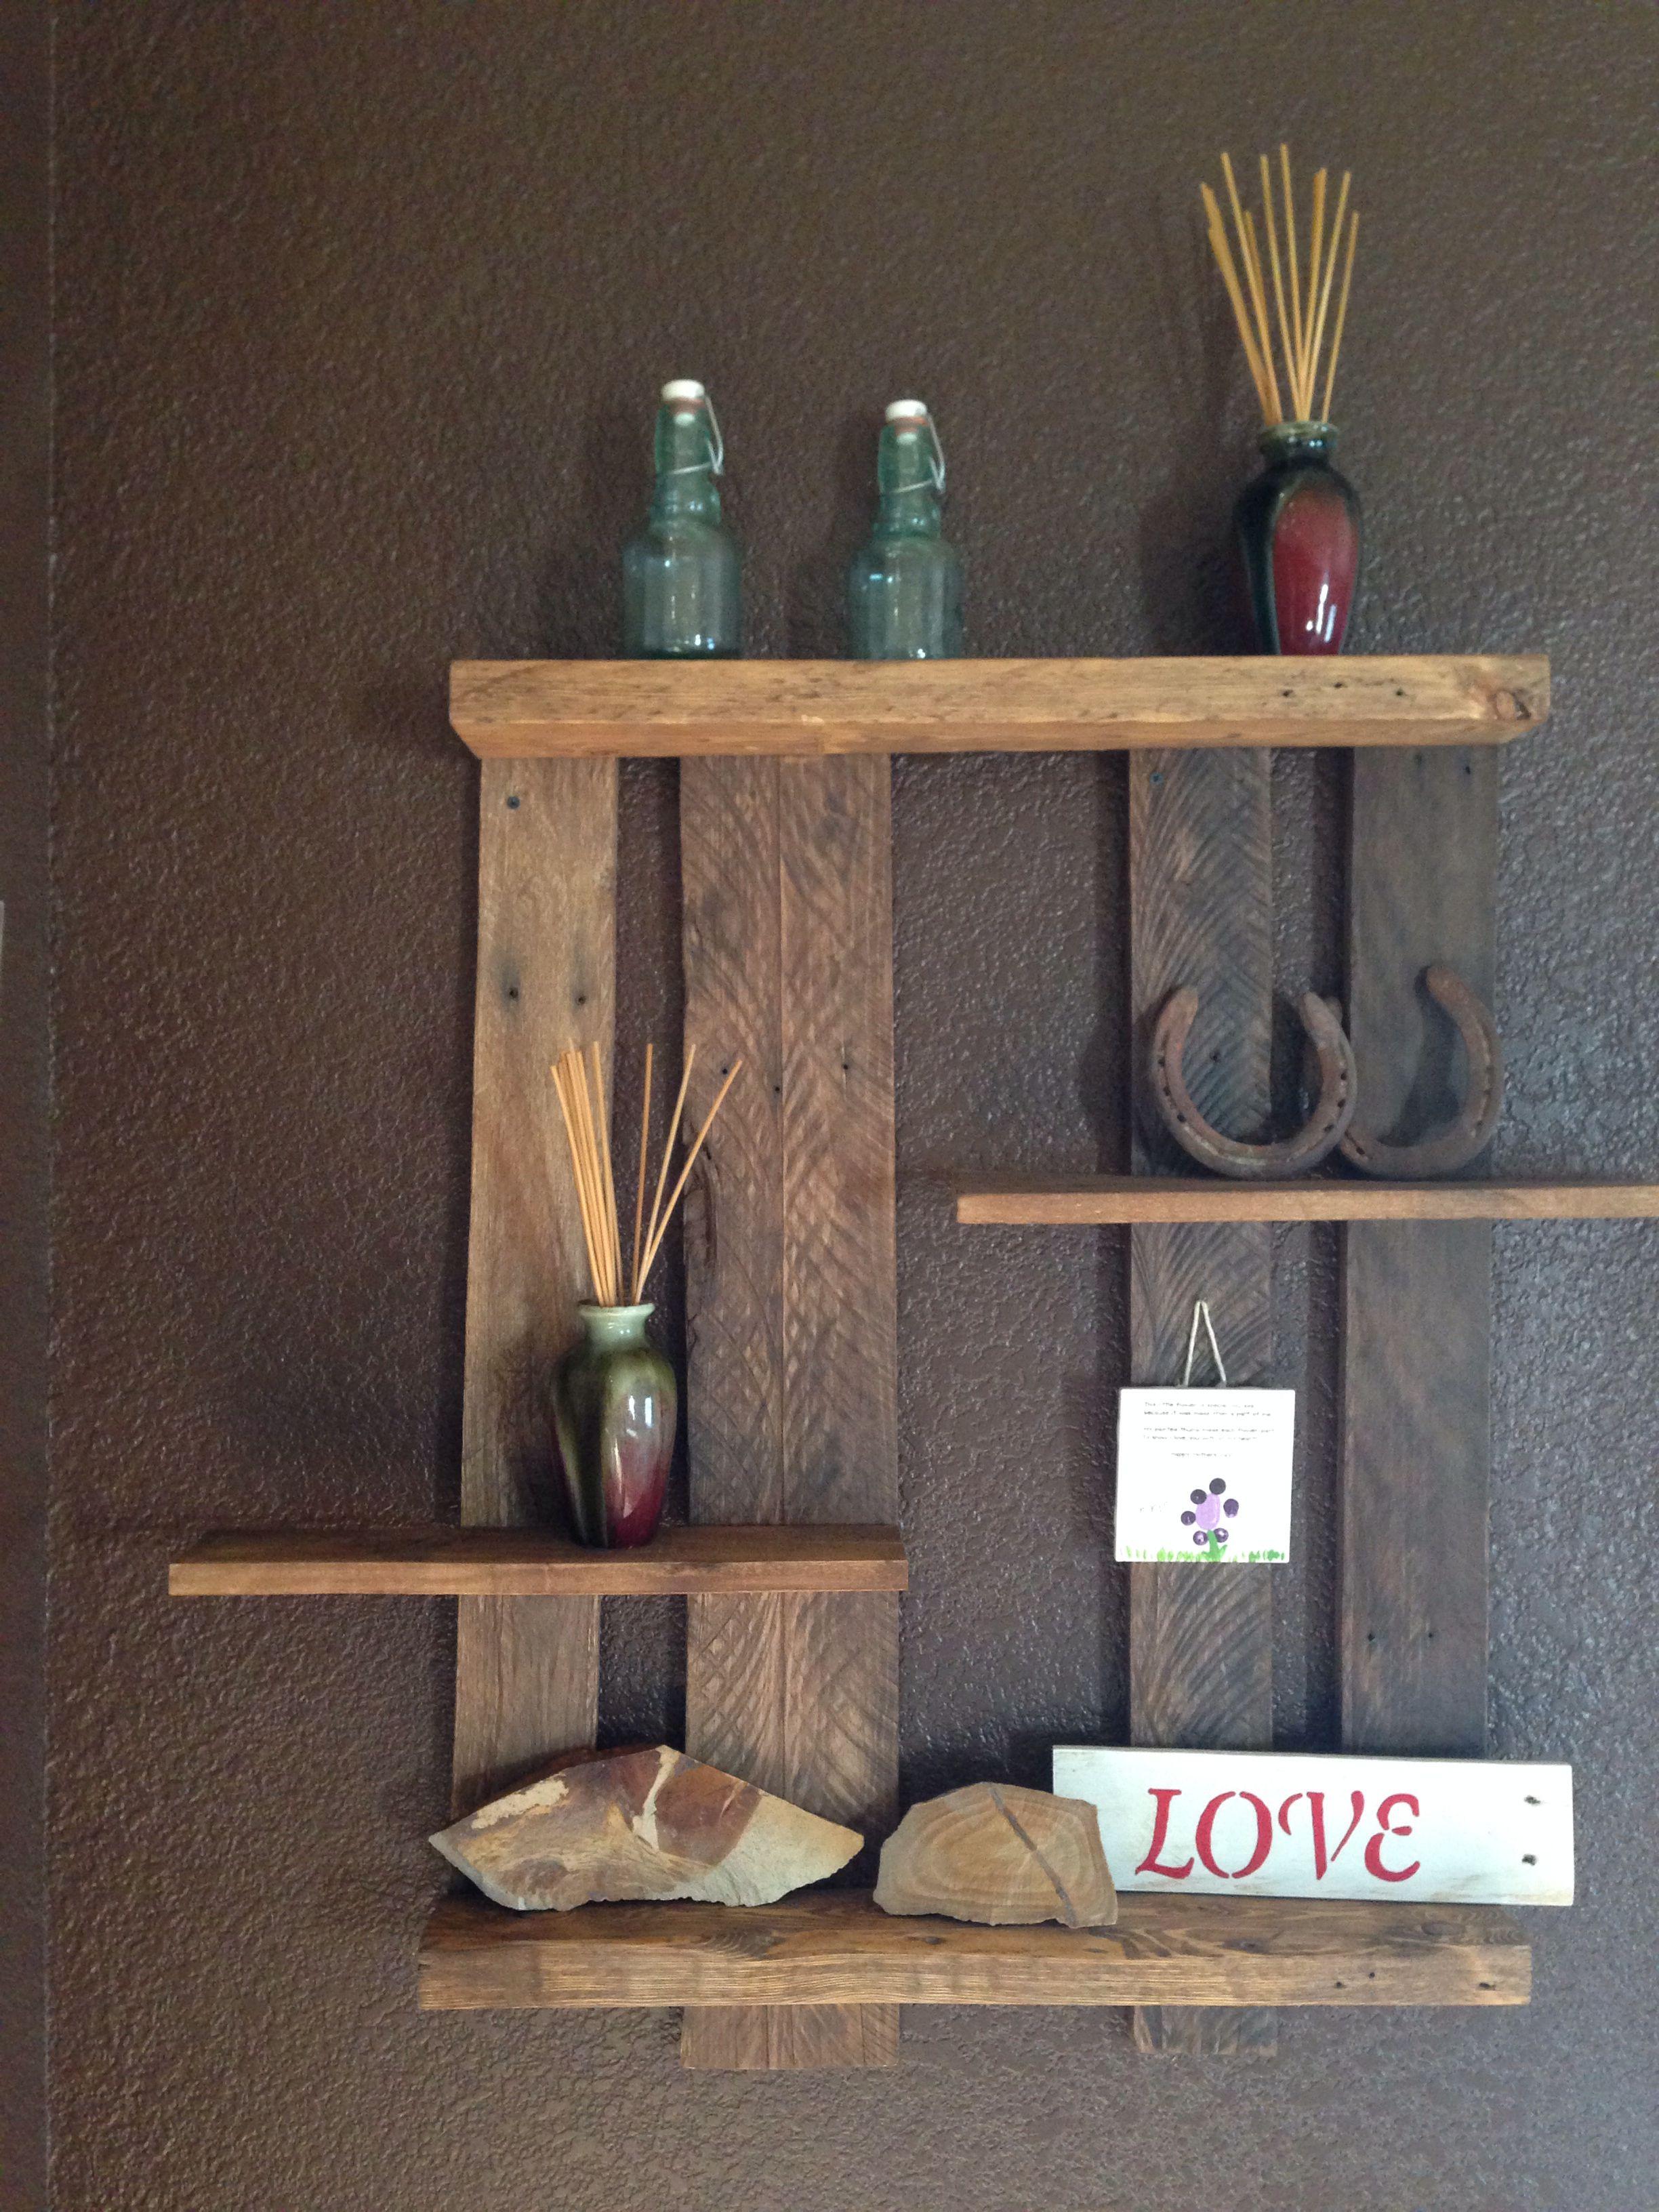 Diy/Pallet shelf/I made myself! Love it! Diy pallet project/wall ...